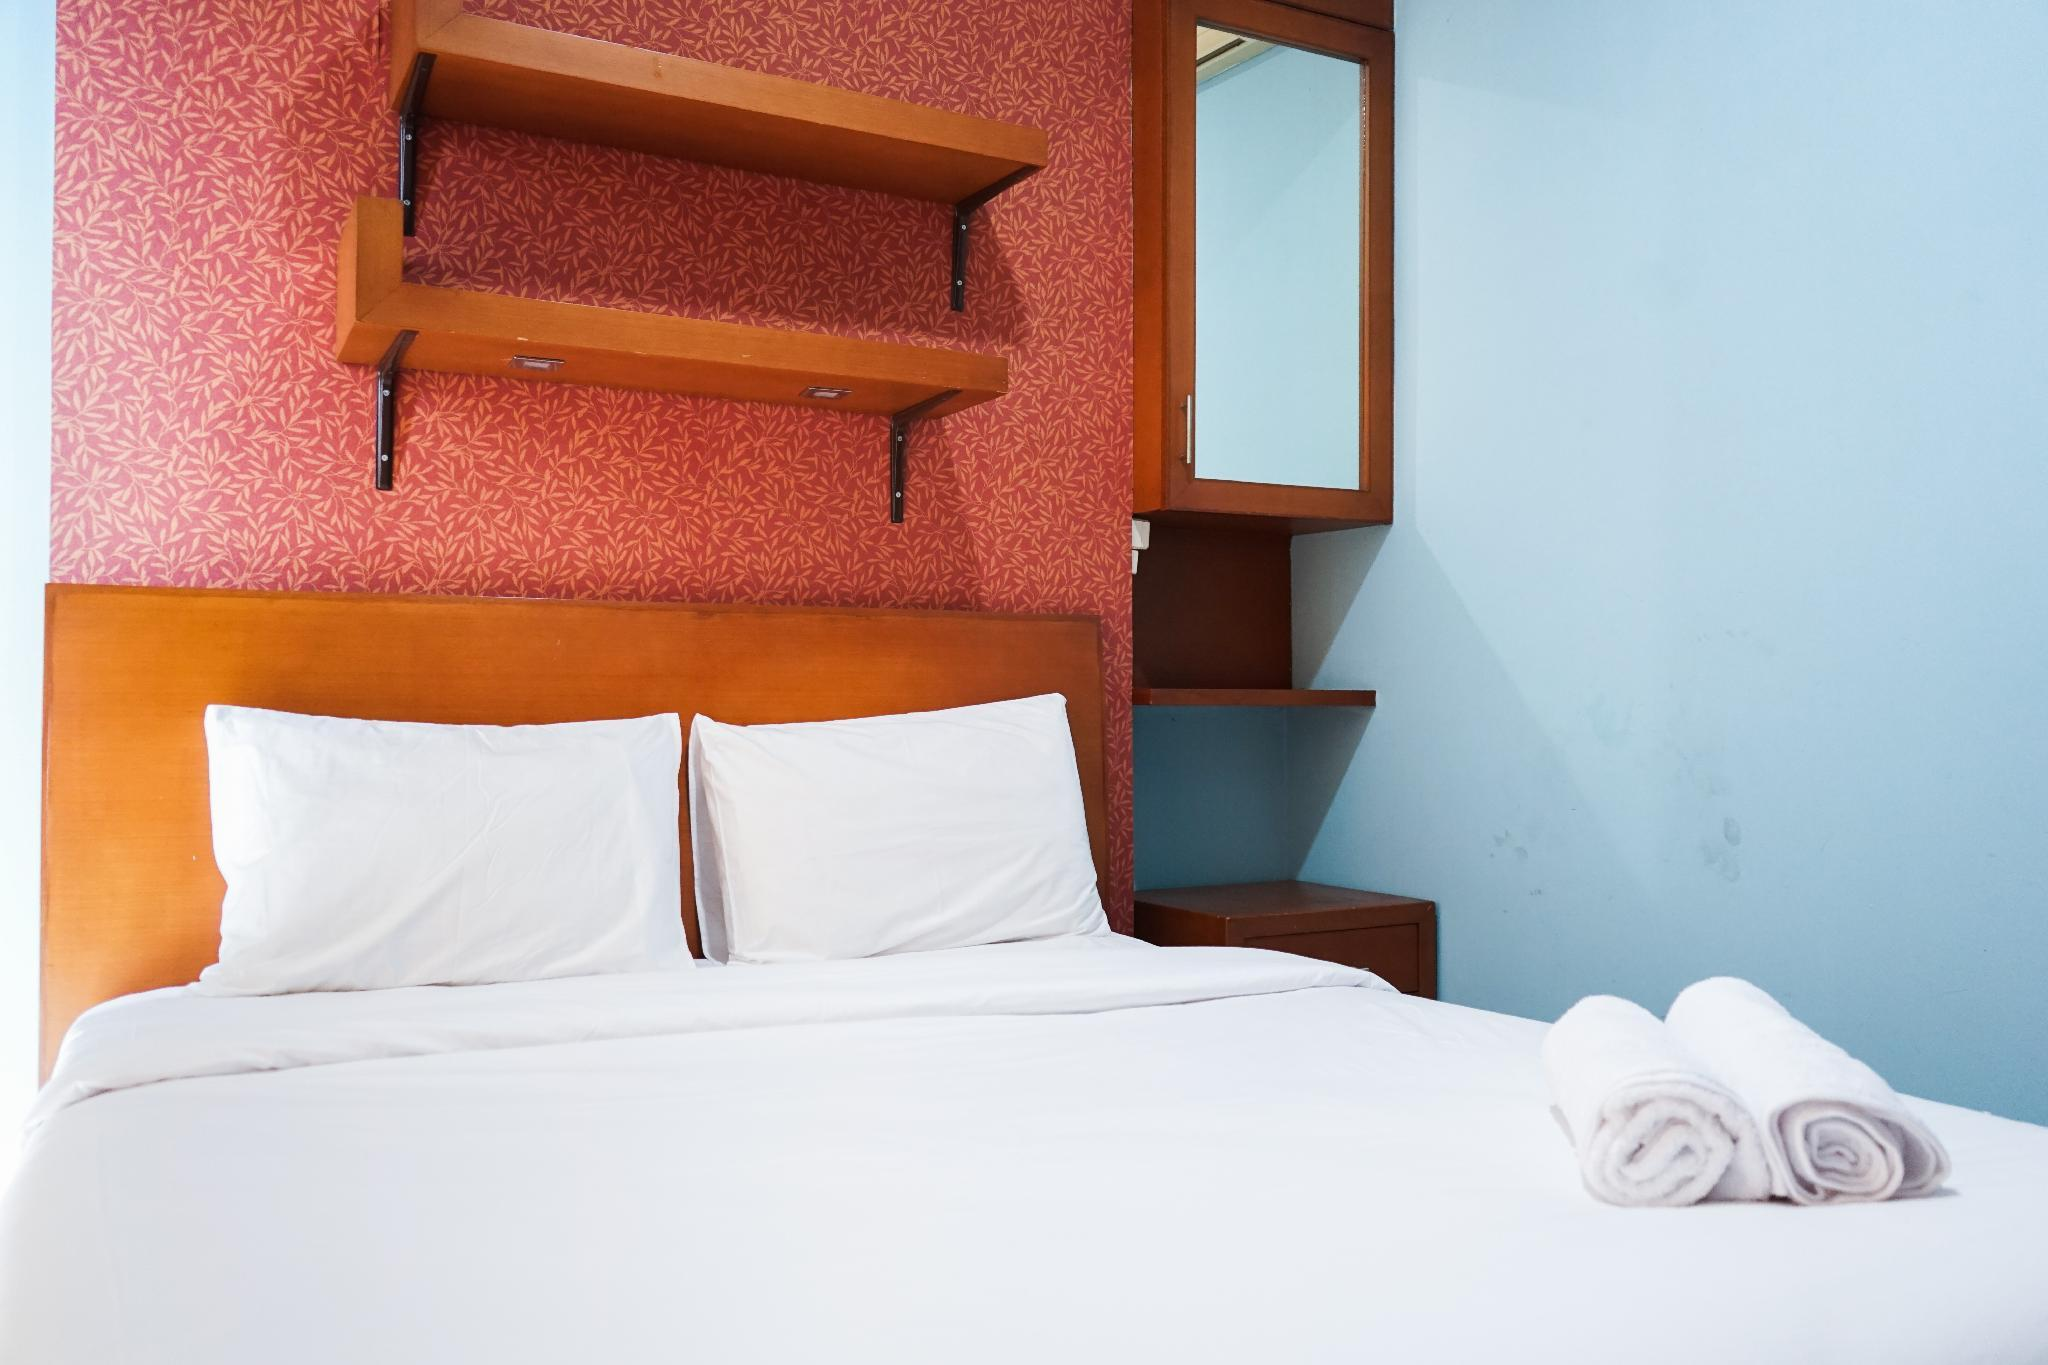 1BR Apt At Marbella Kemang Residence By Travelio